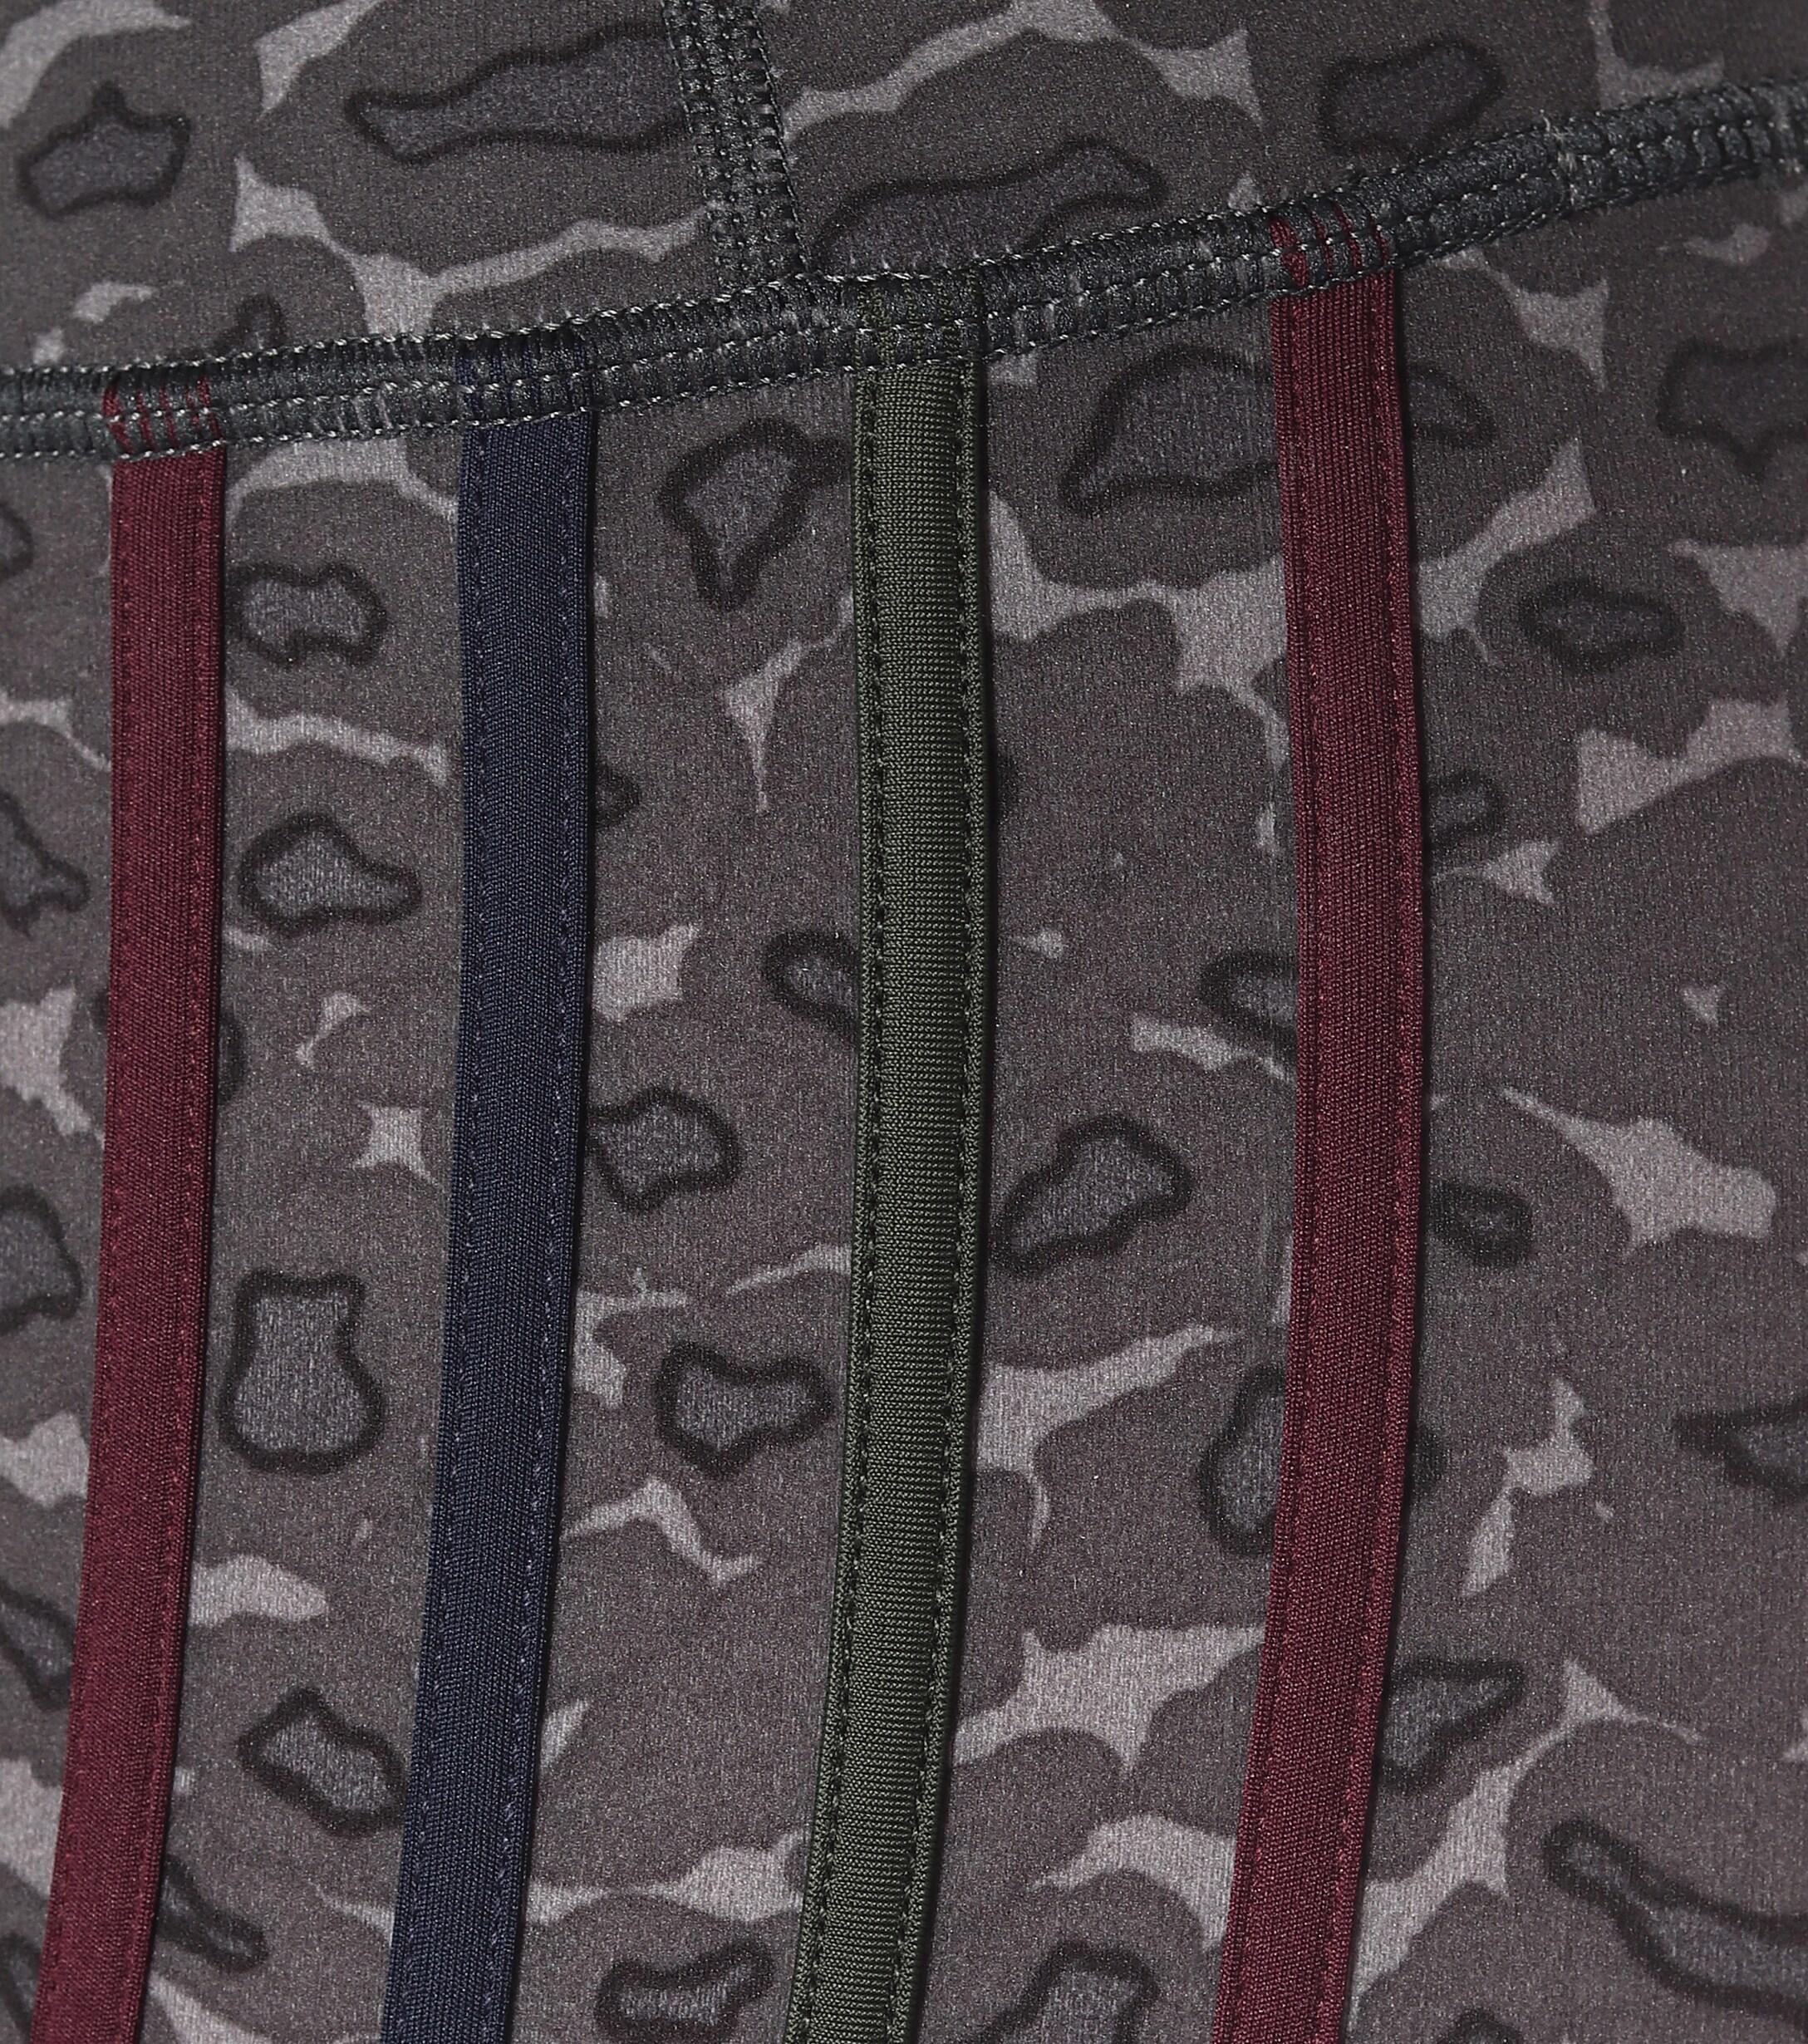 1ec40b378d1ba8 The Upside - Multicolor Snow Leopard Nyc leggings - Lyst. View fullscreen